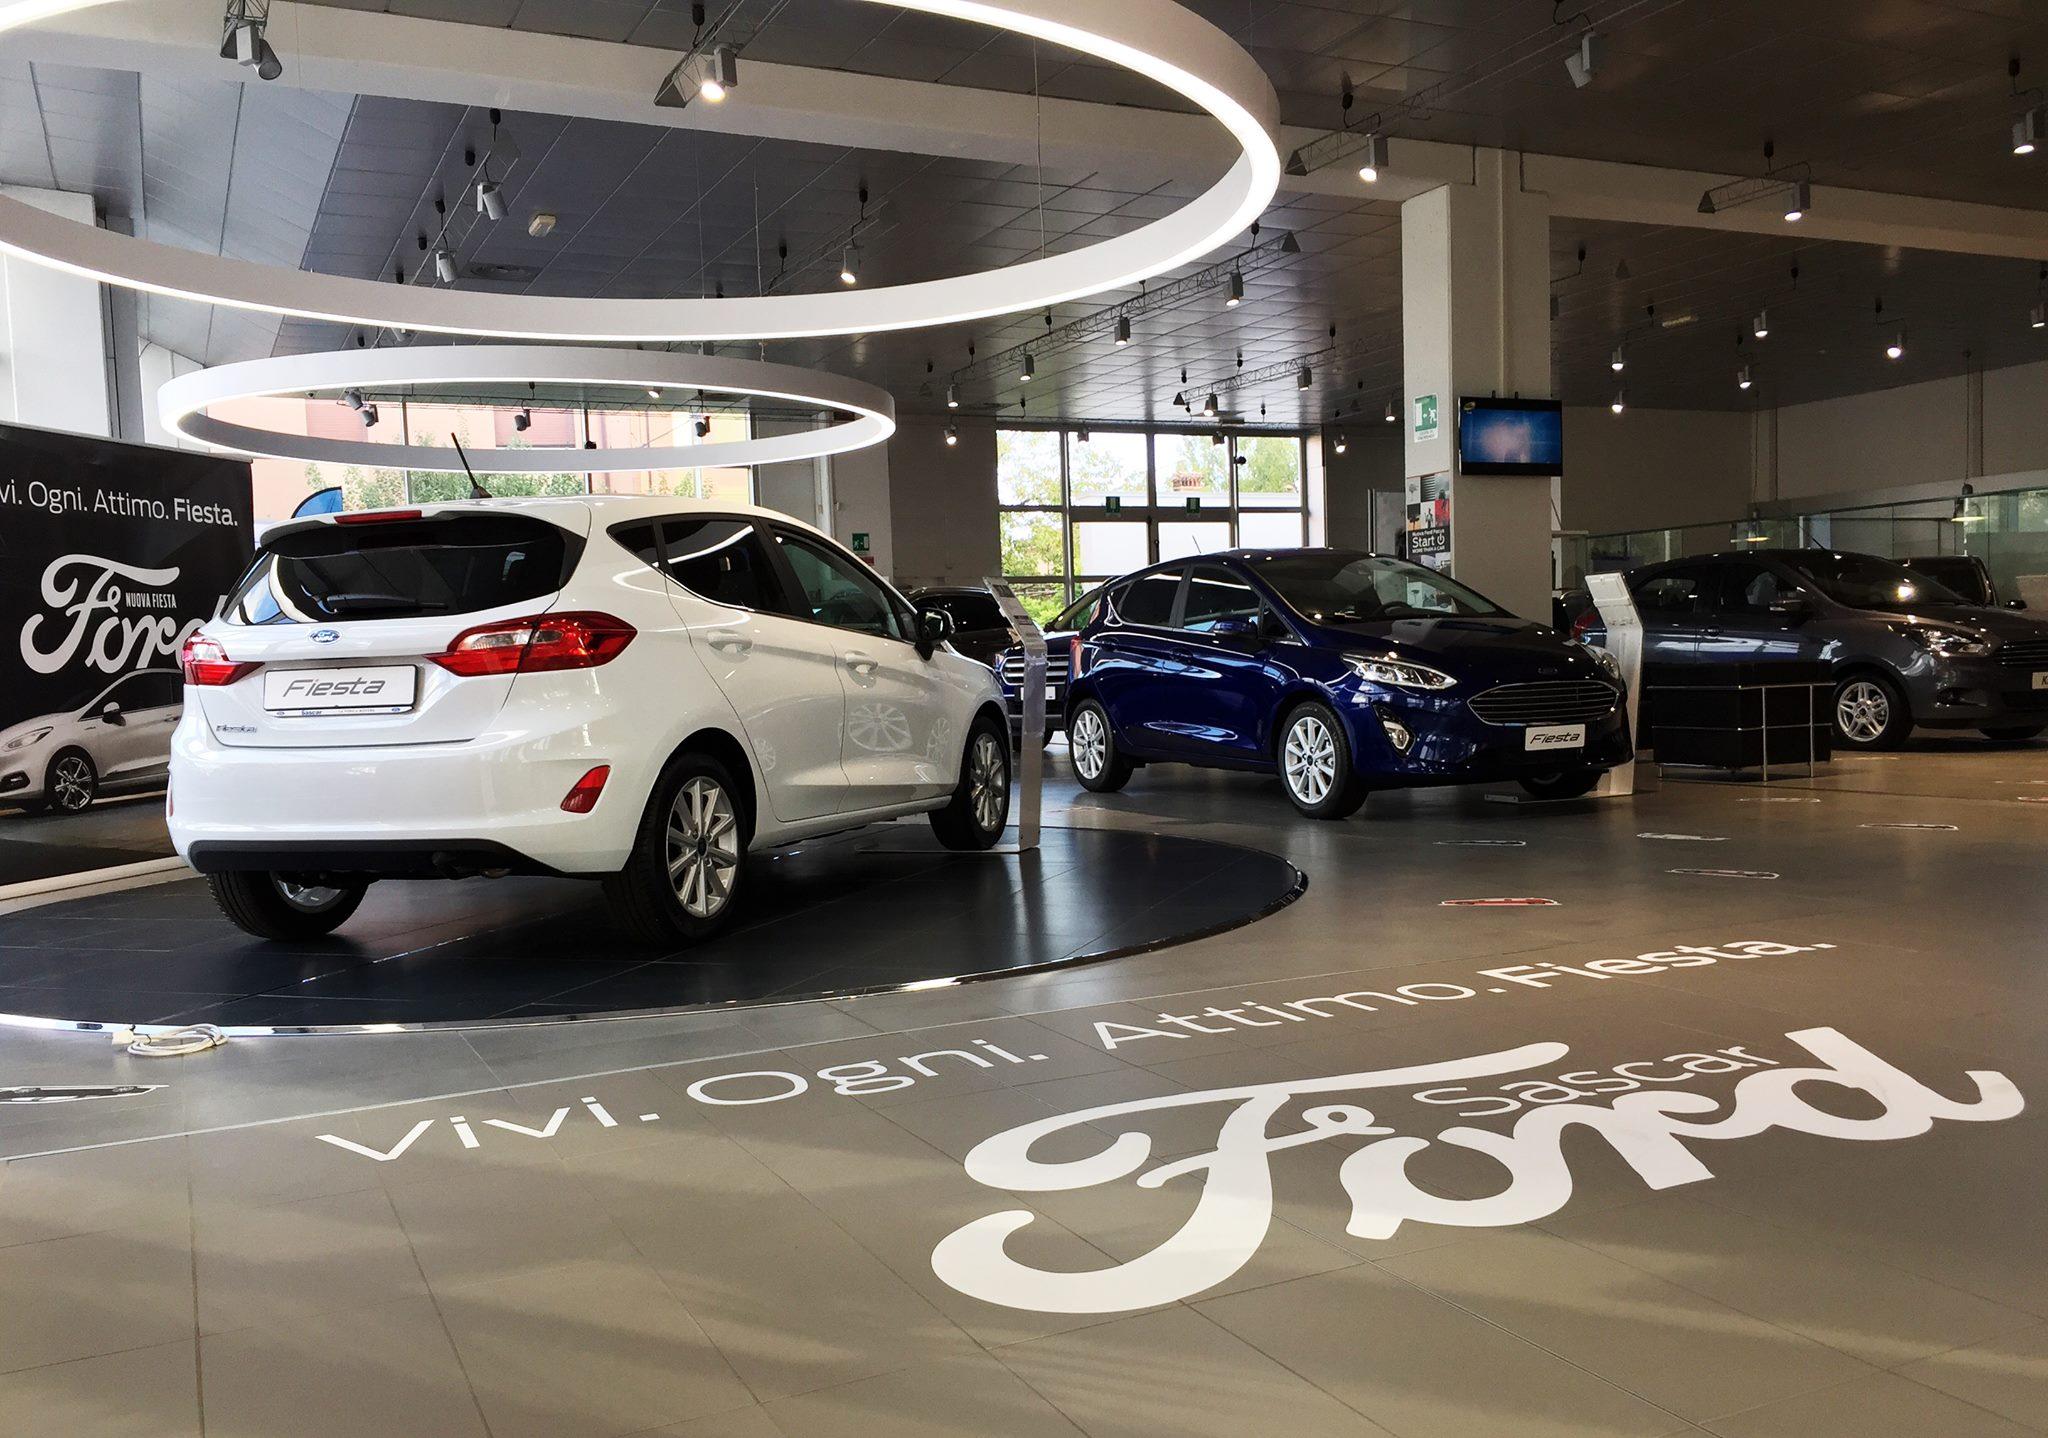 Ford Sascar Modena